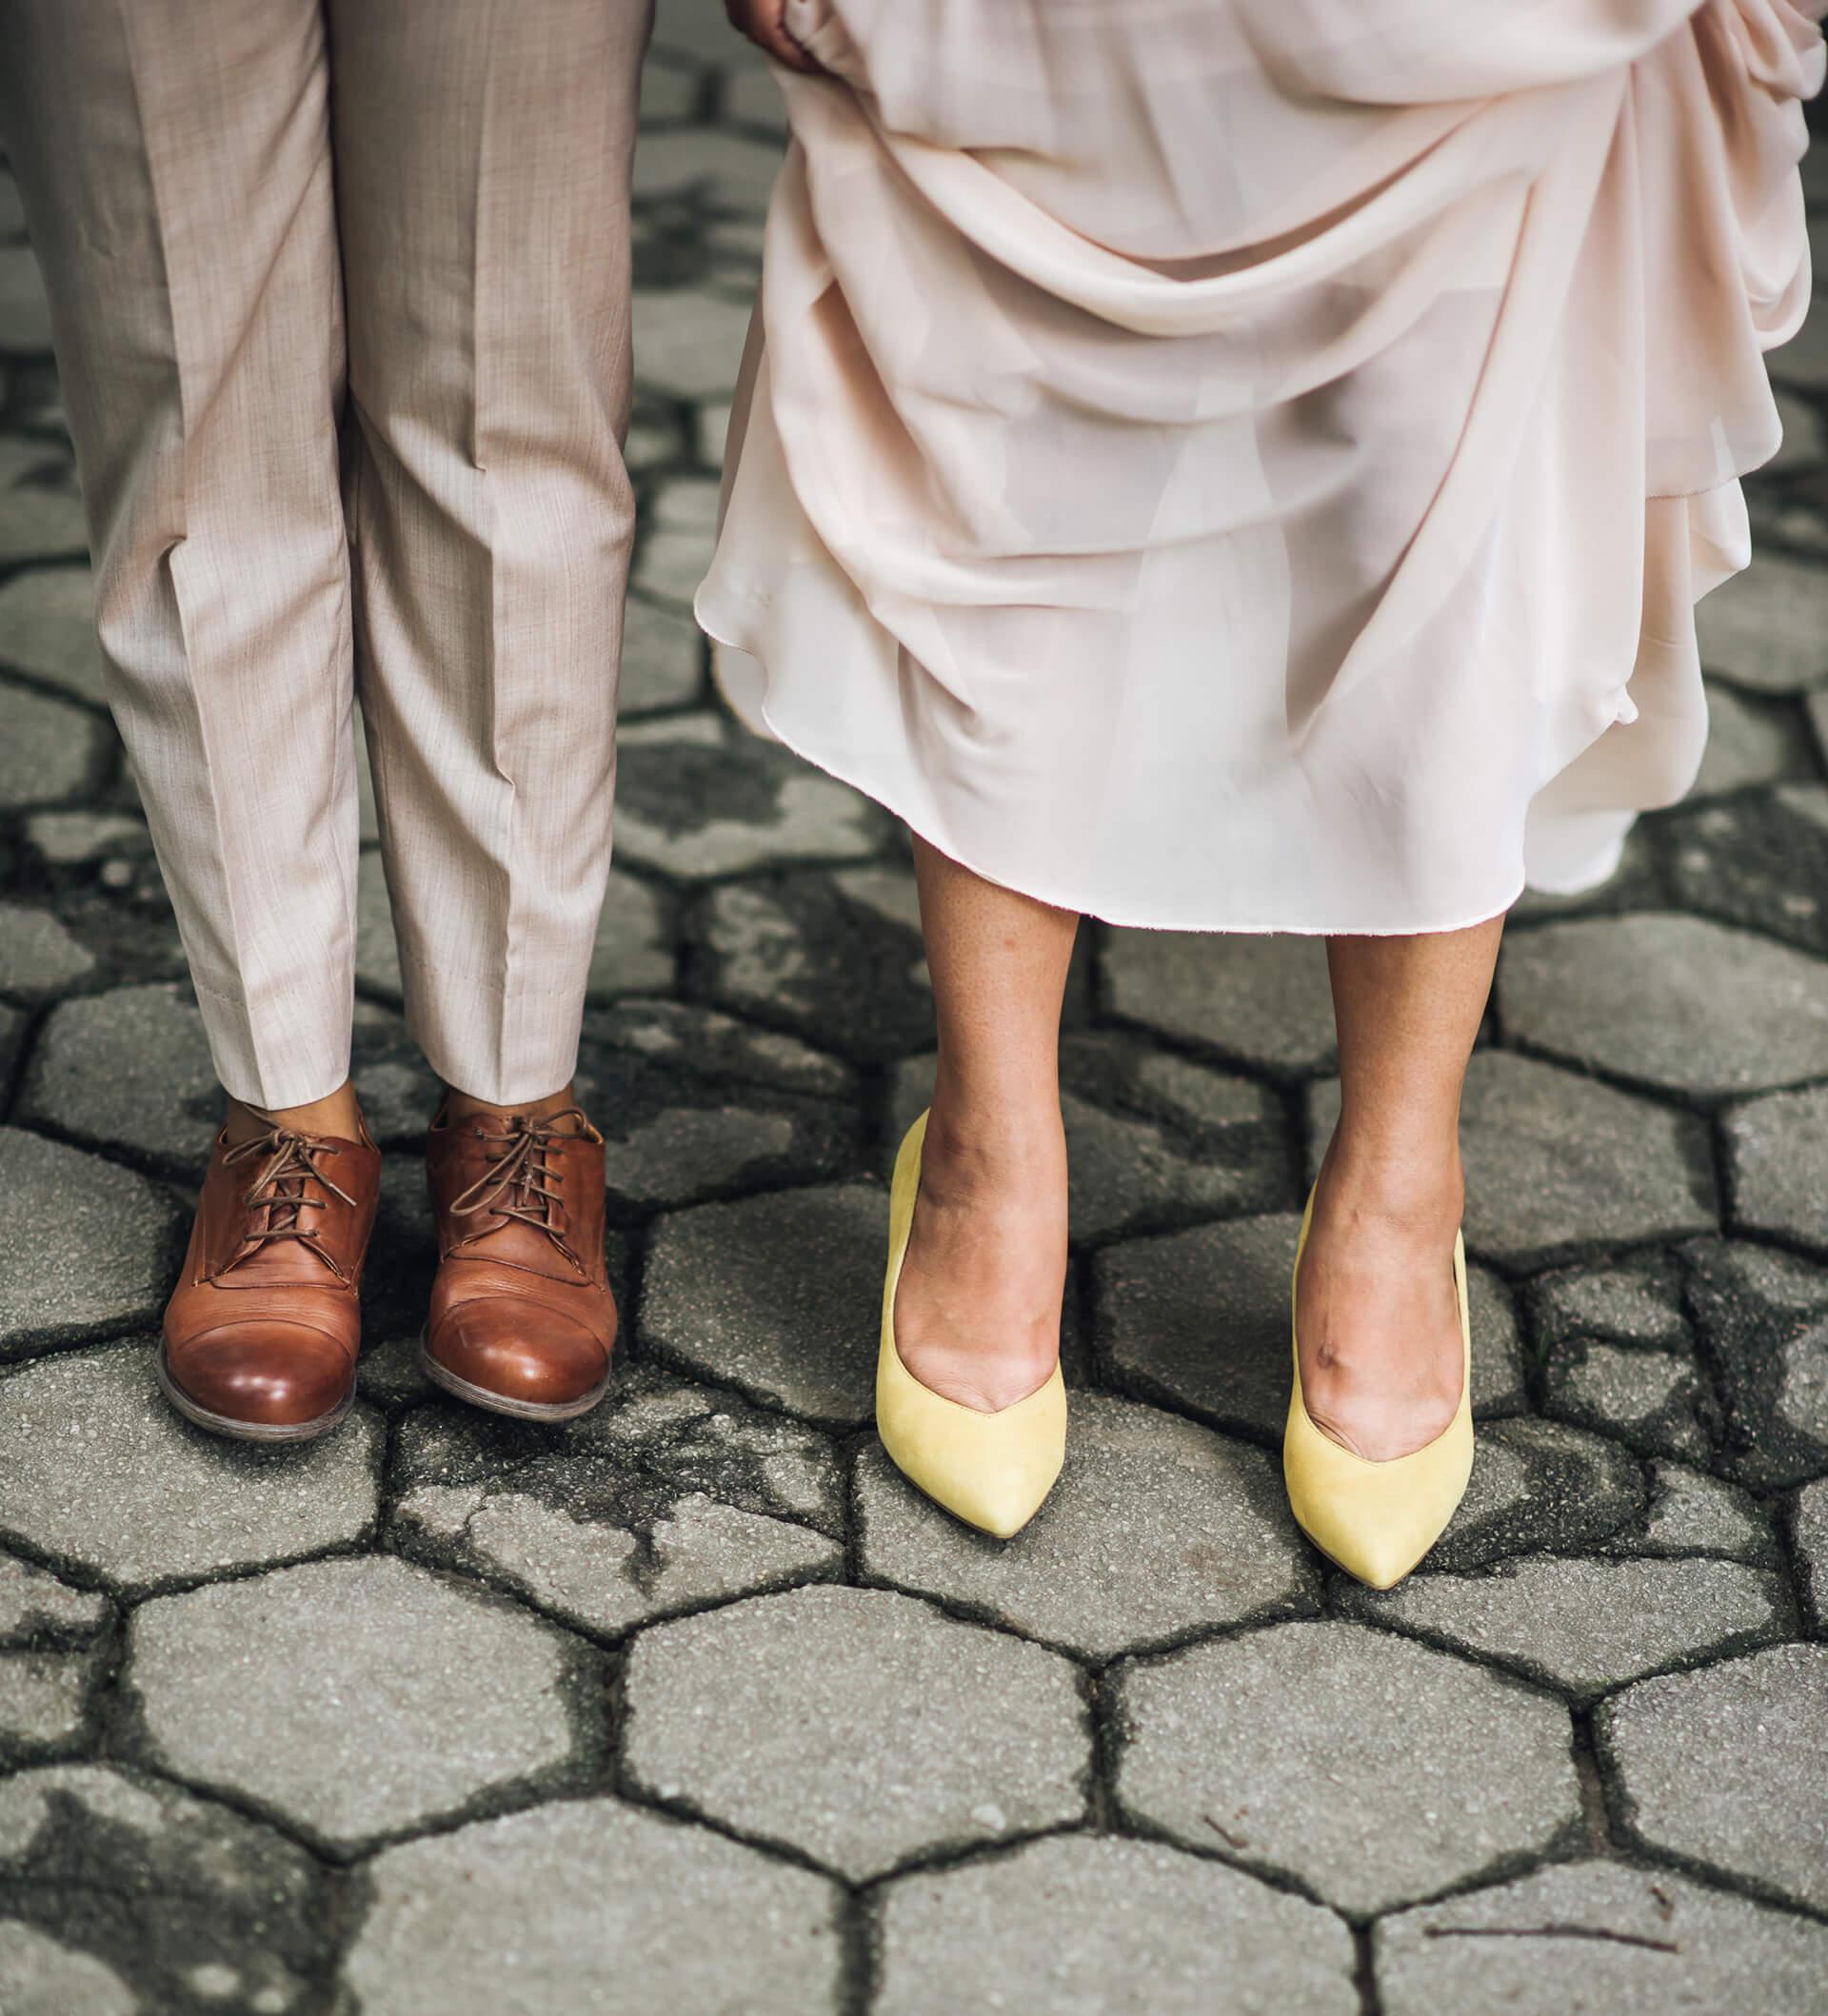 BROOKLYN SOCIETY FOR ETHICAL CULTURE - INTIMATE WEDDING - CHI-CHI ARI-128 (1).jpg